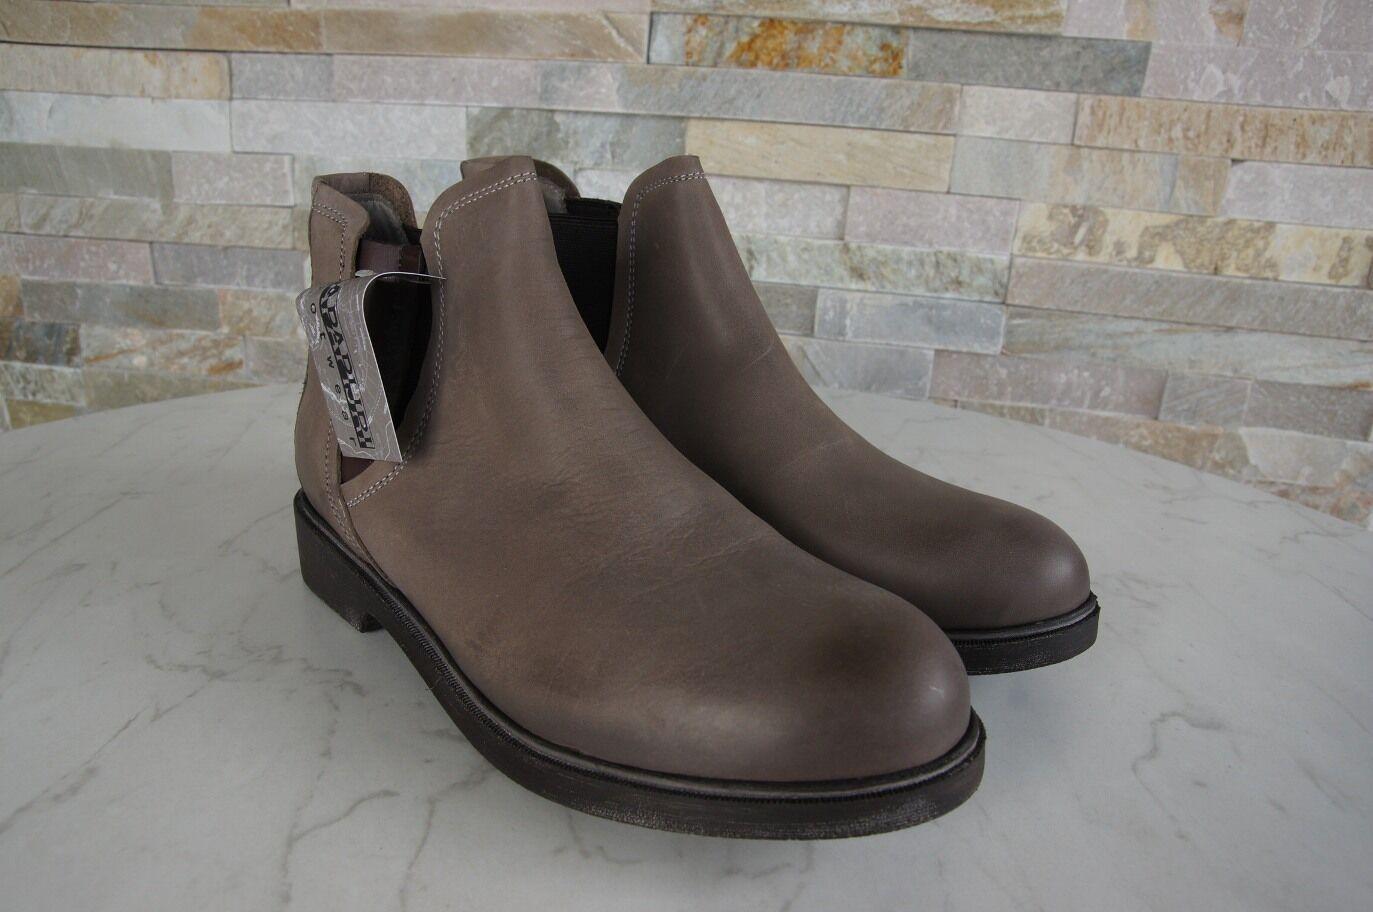 NAPAPIJRI Schuhe Gr 36 Stiefeletten Chelsea Stiefel Schuhe NAPAPIJRI schuhe Klara taupe NEU c0d86d